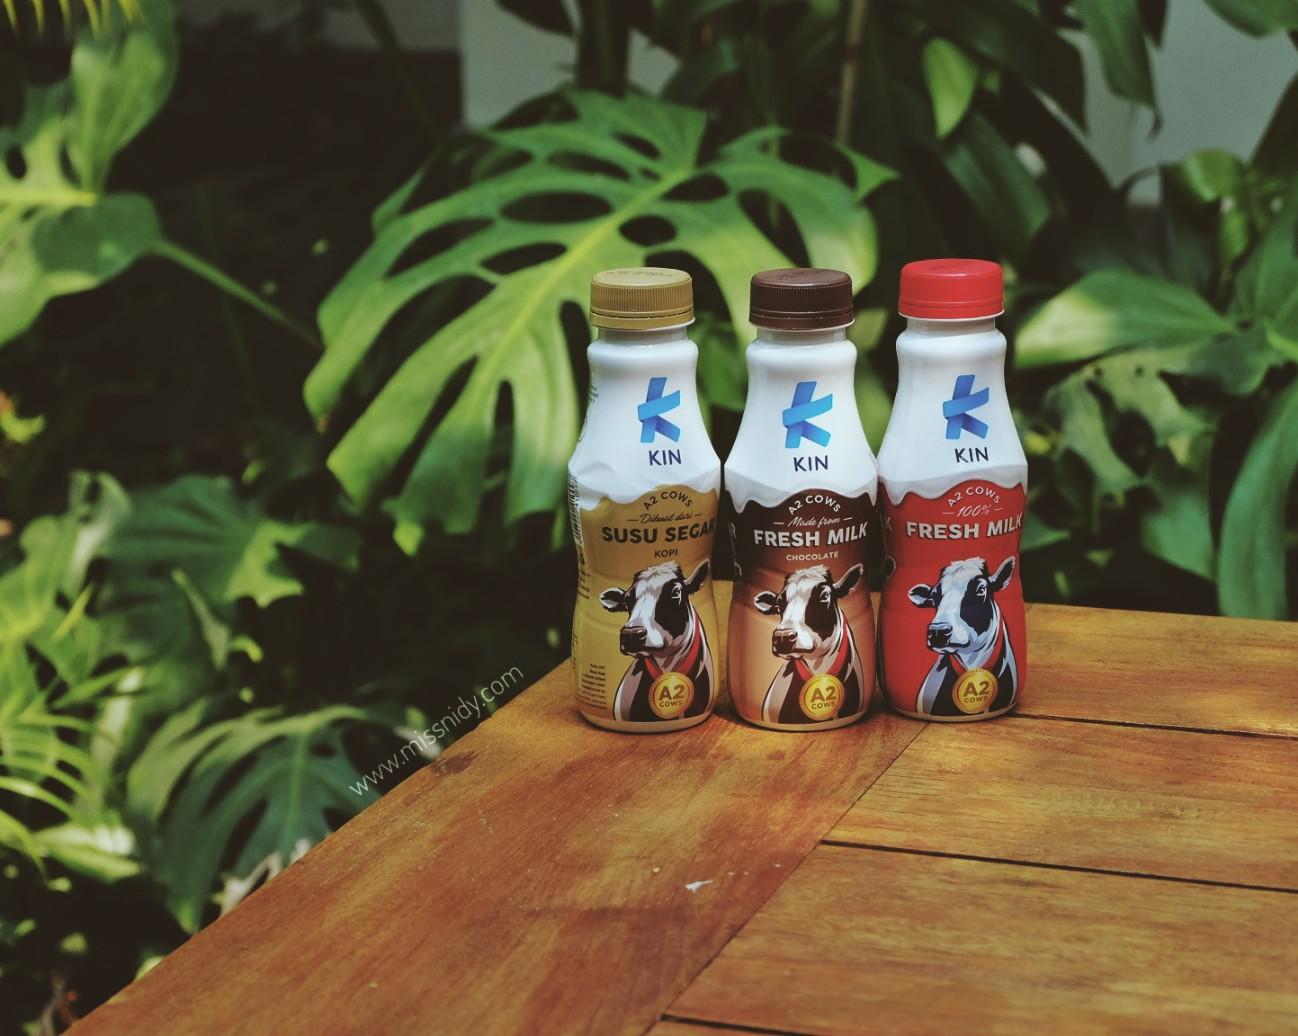 harga kin fresh milk terbaru